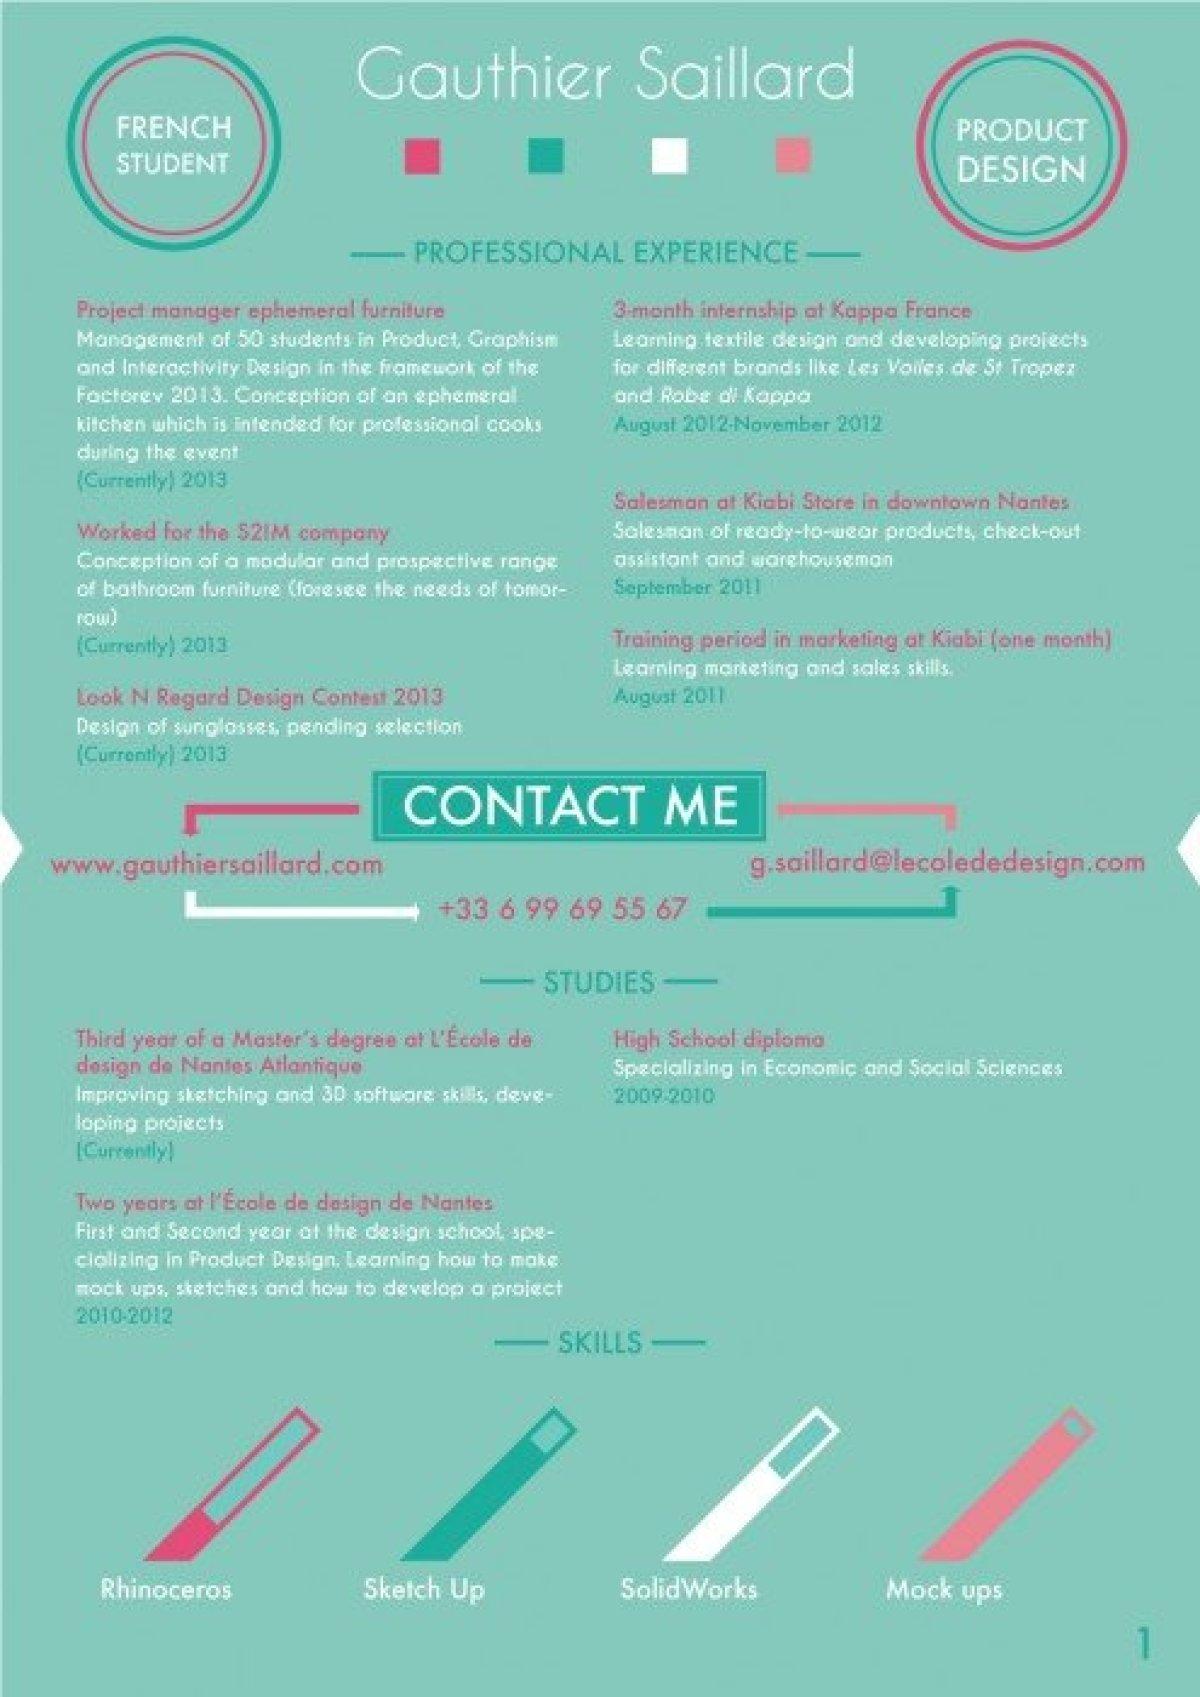 f30dde304a2a6735174290975764adb9 10 creative cv และ resume ที่สร้างตัวเองโดดเด่น